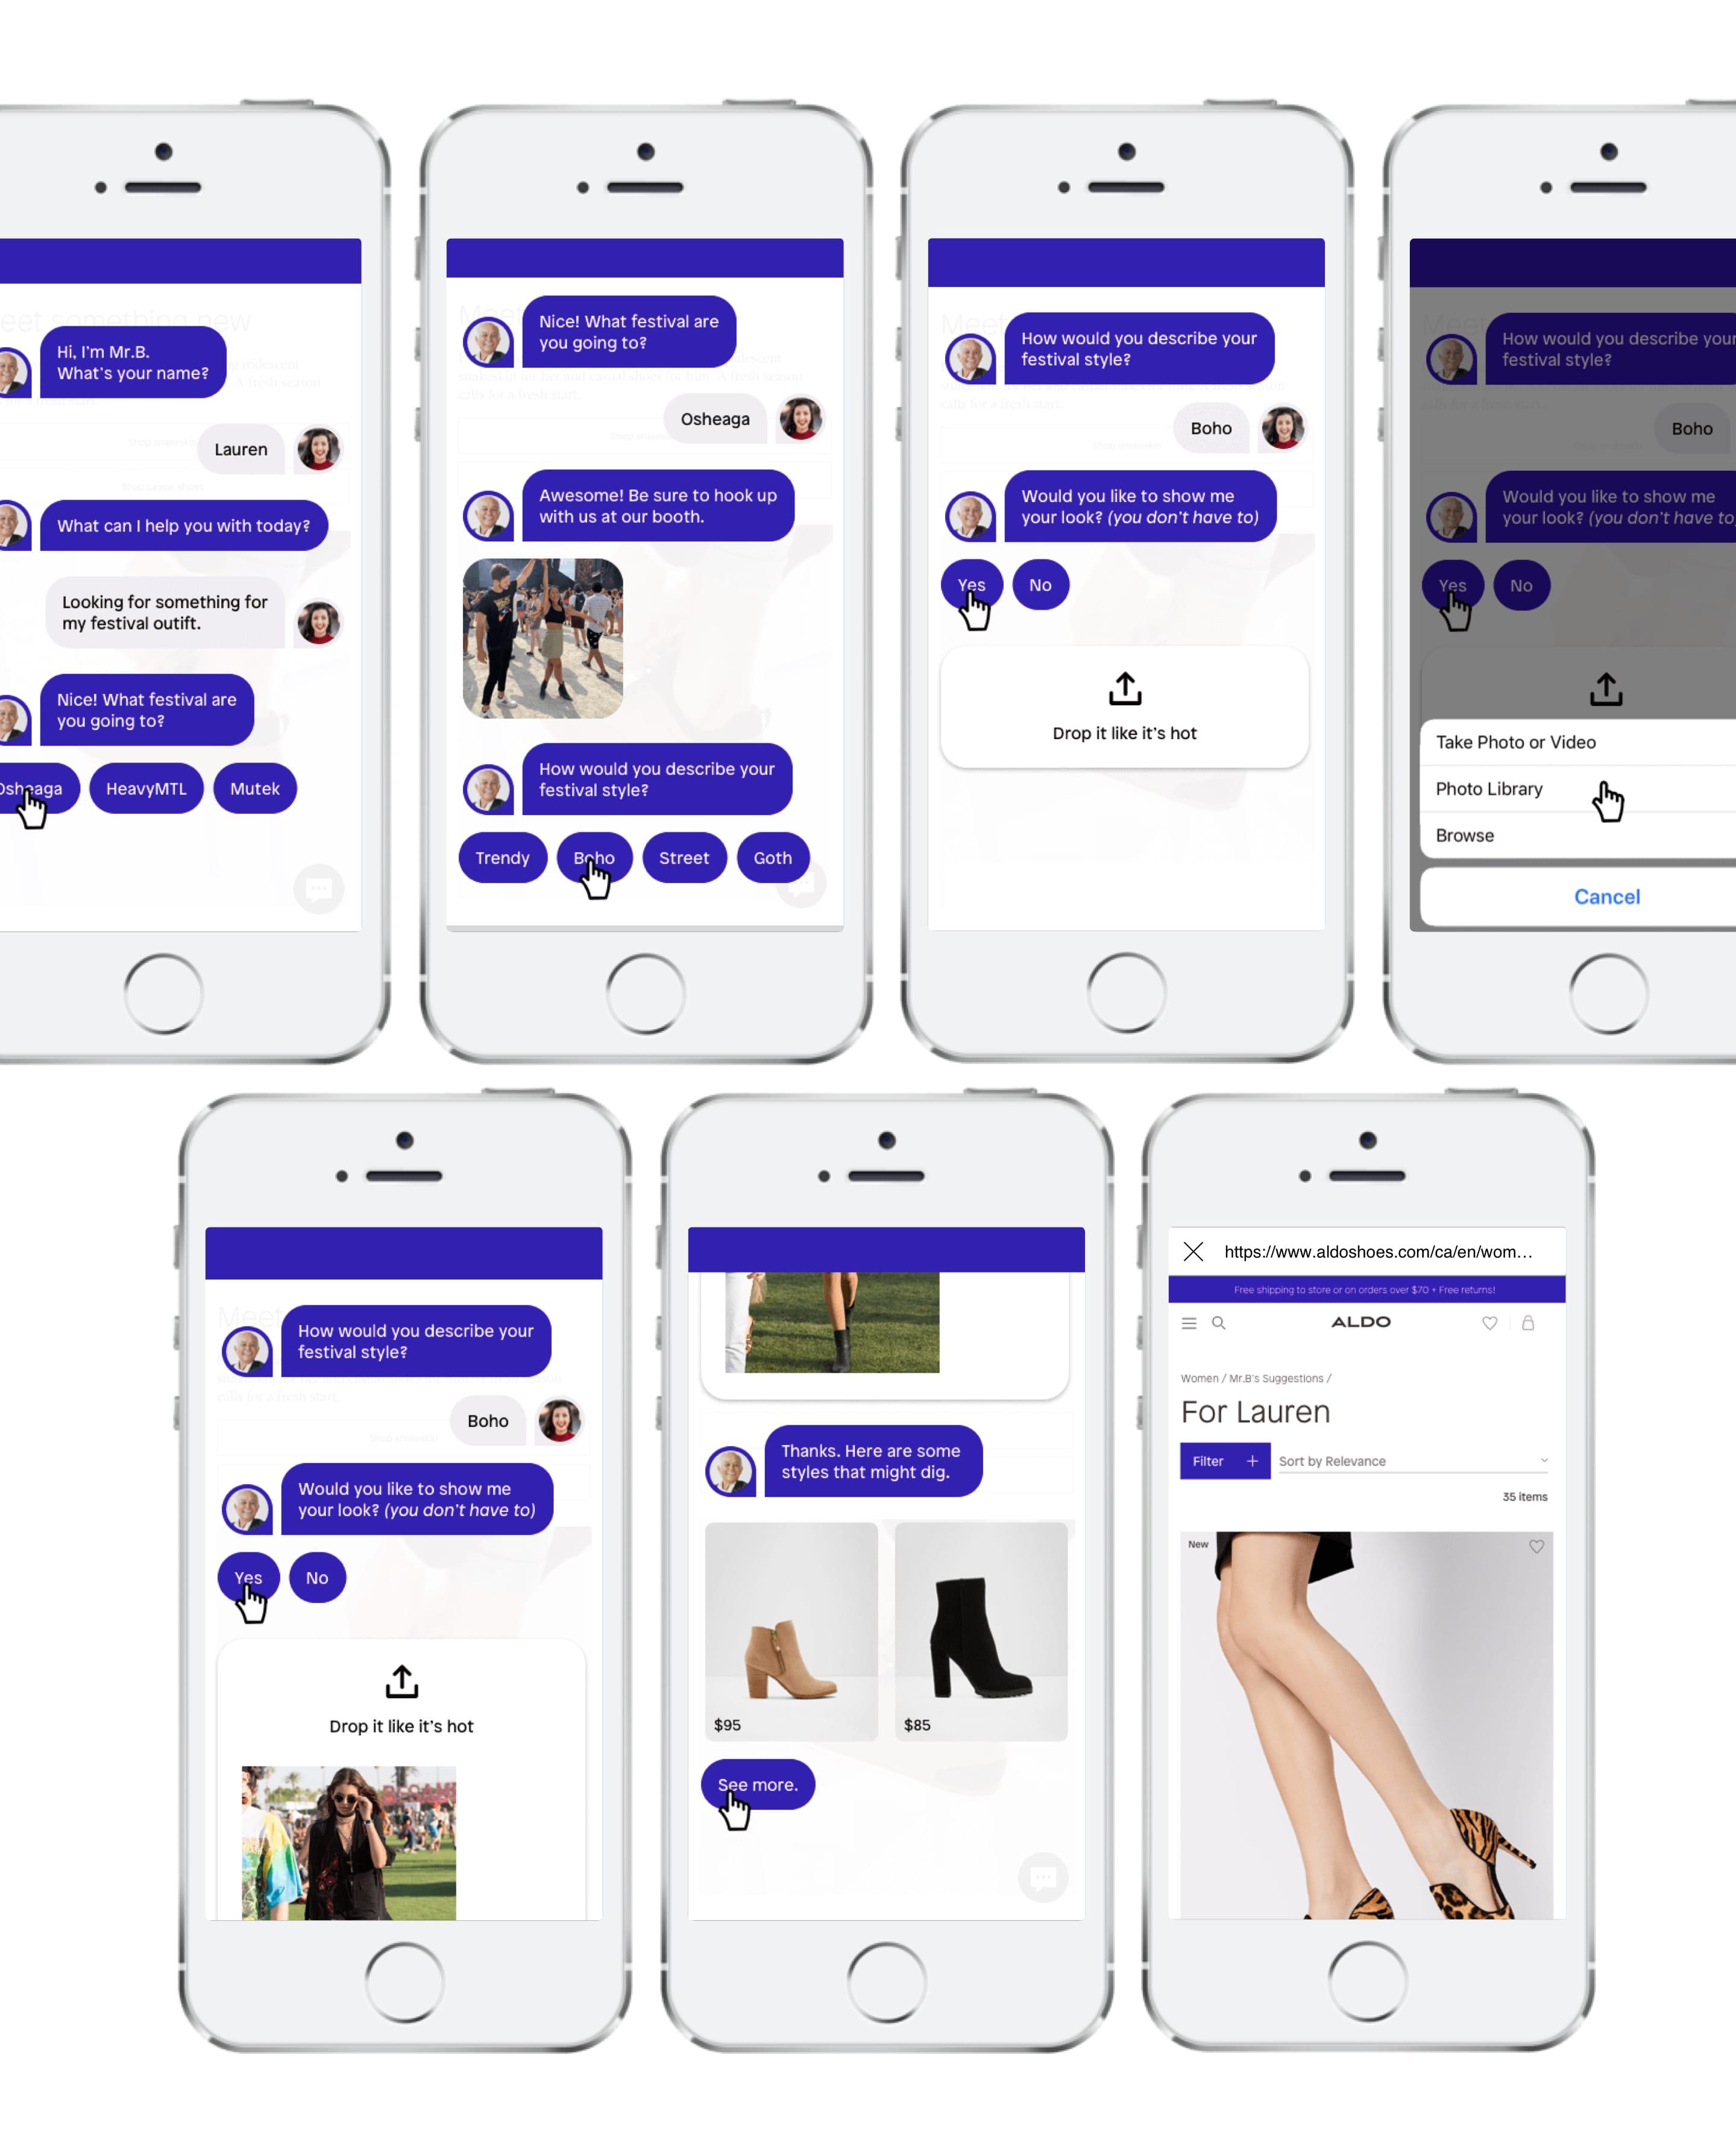 Chatbot conversation - virtual stylist - festival styles.